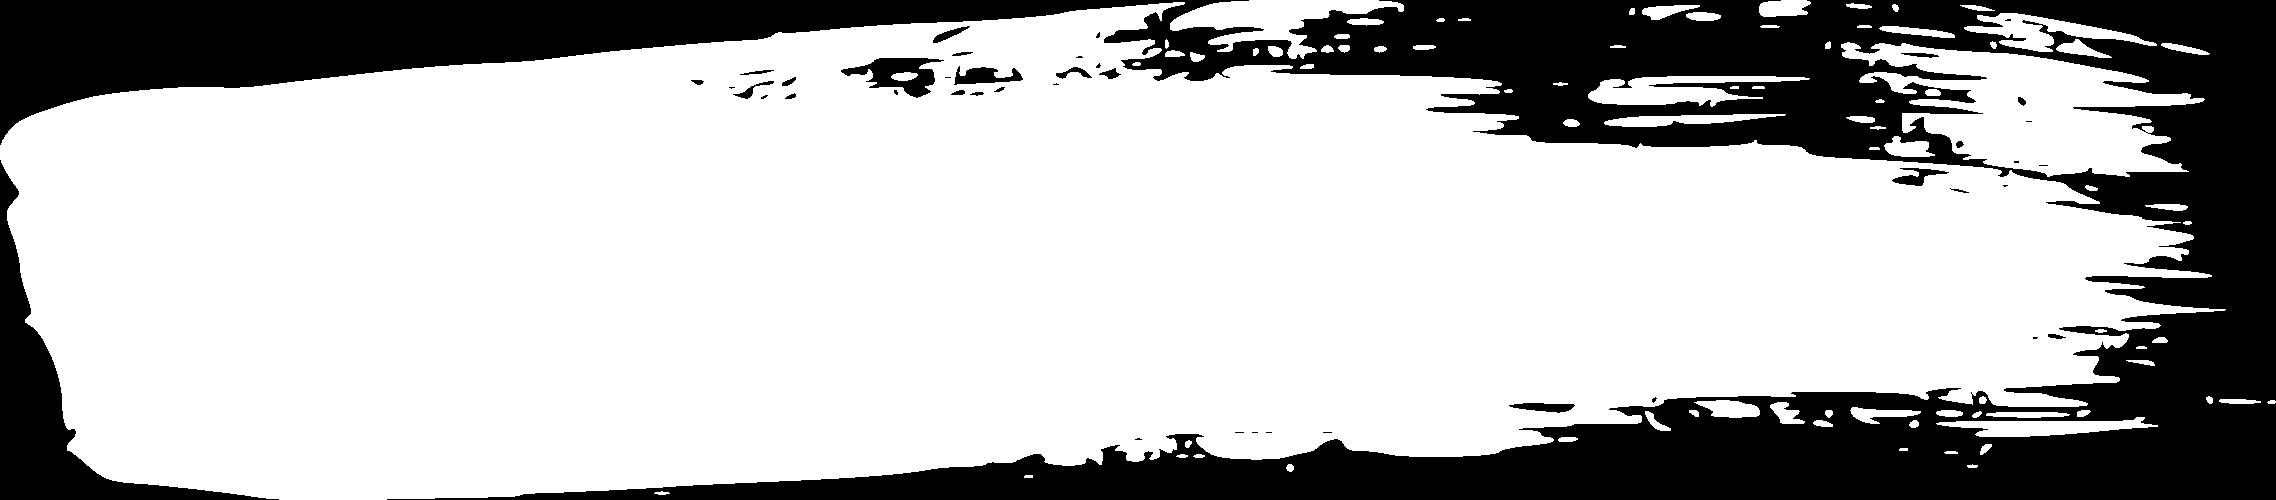 14 White Grunge Brush Stroke Png Transparent Onlygfx Com